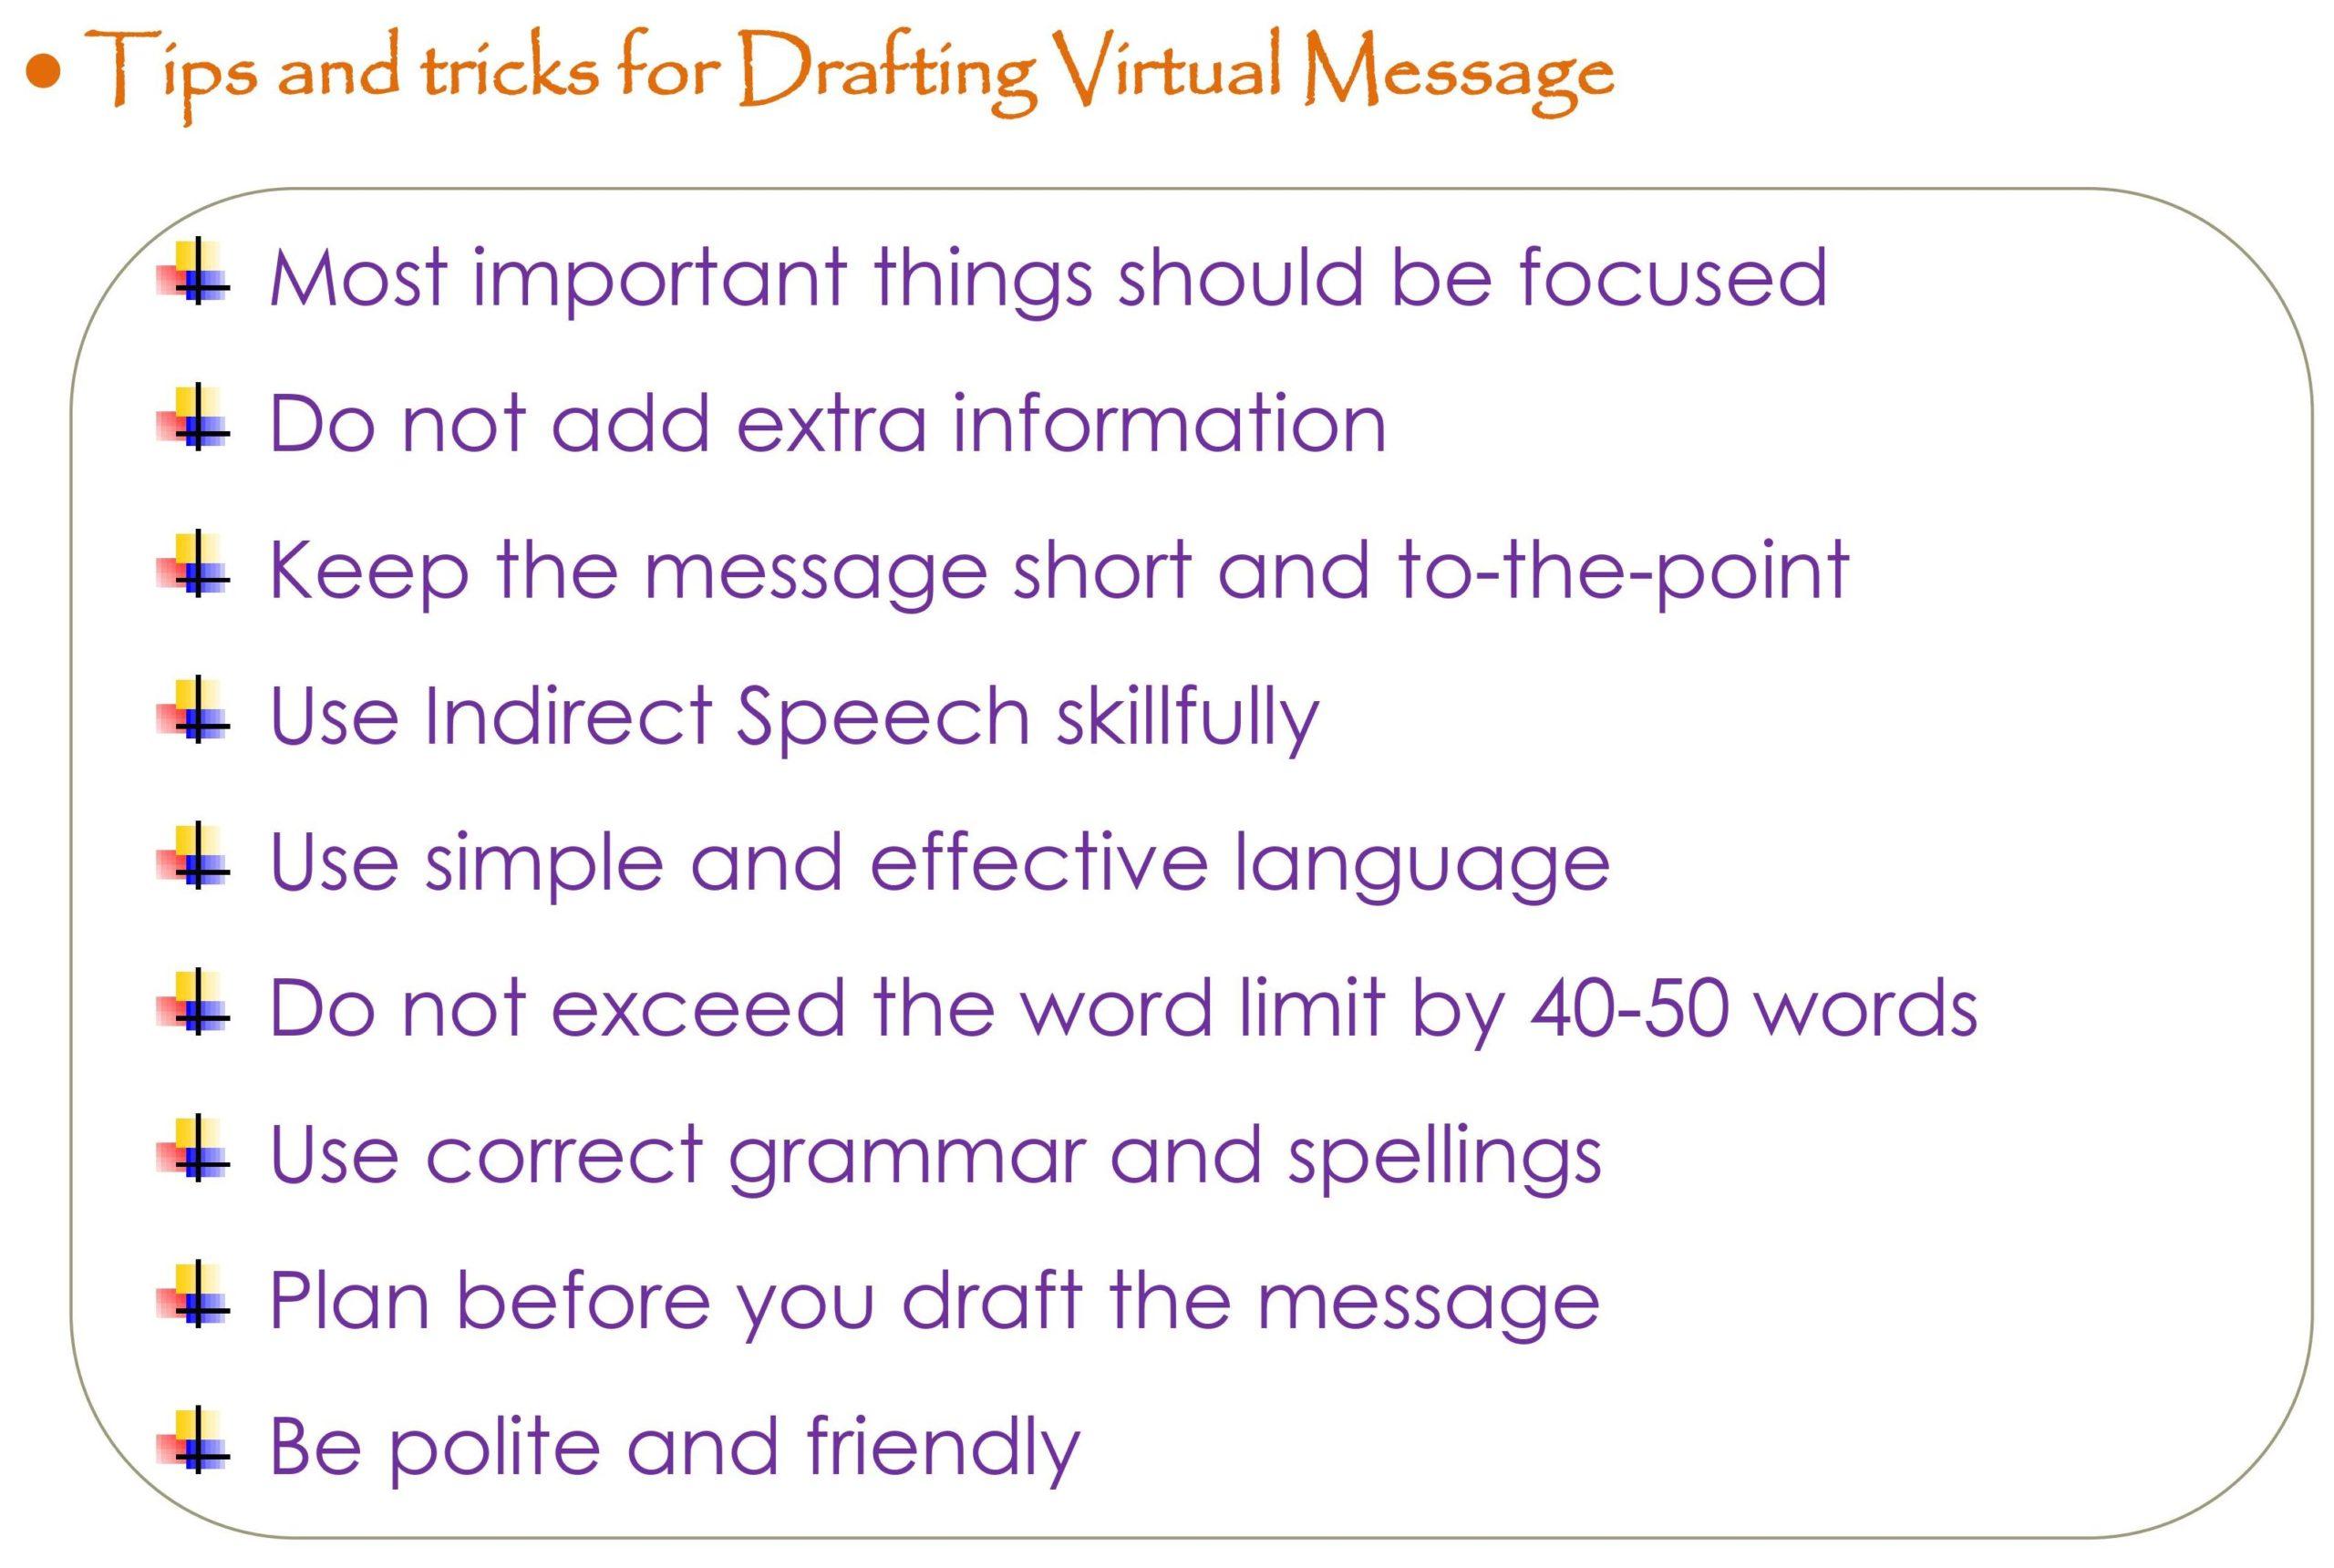 drafting_virtual_message_15